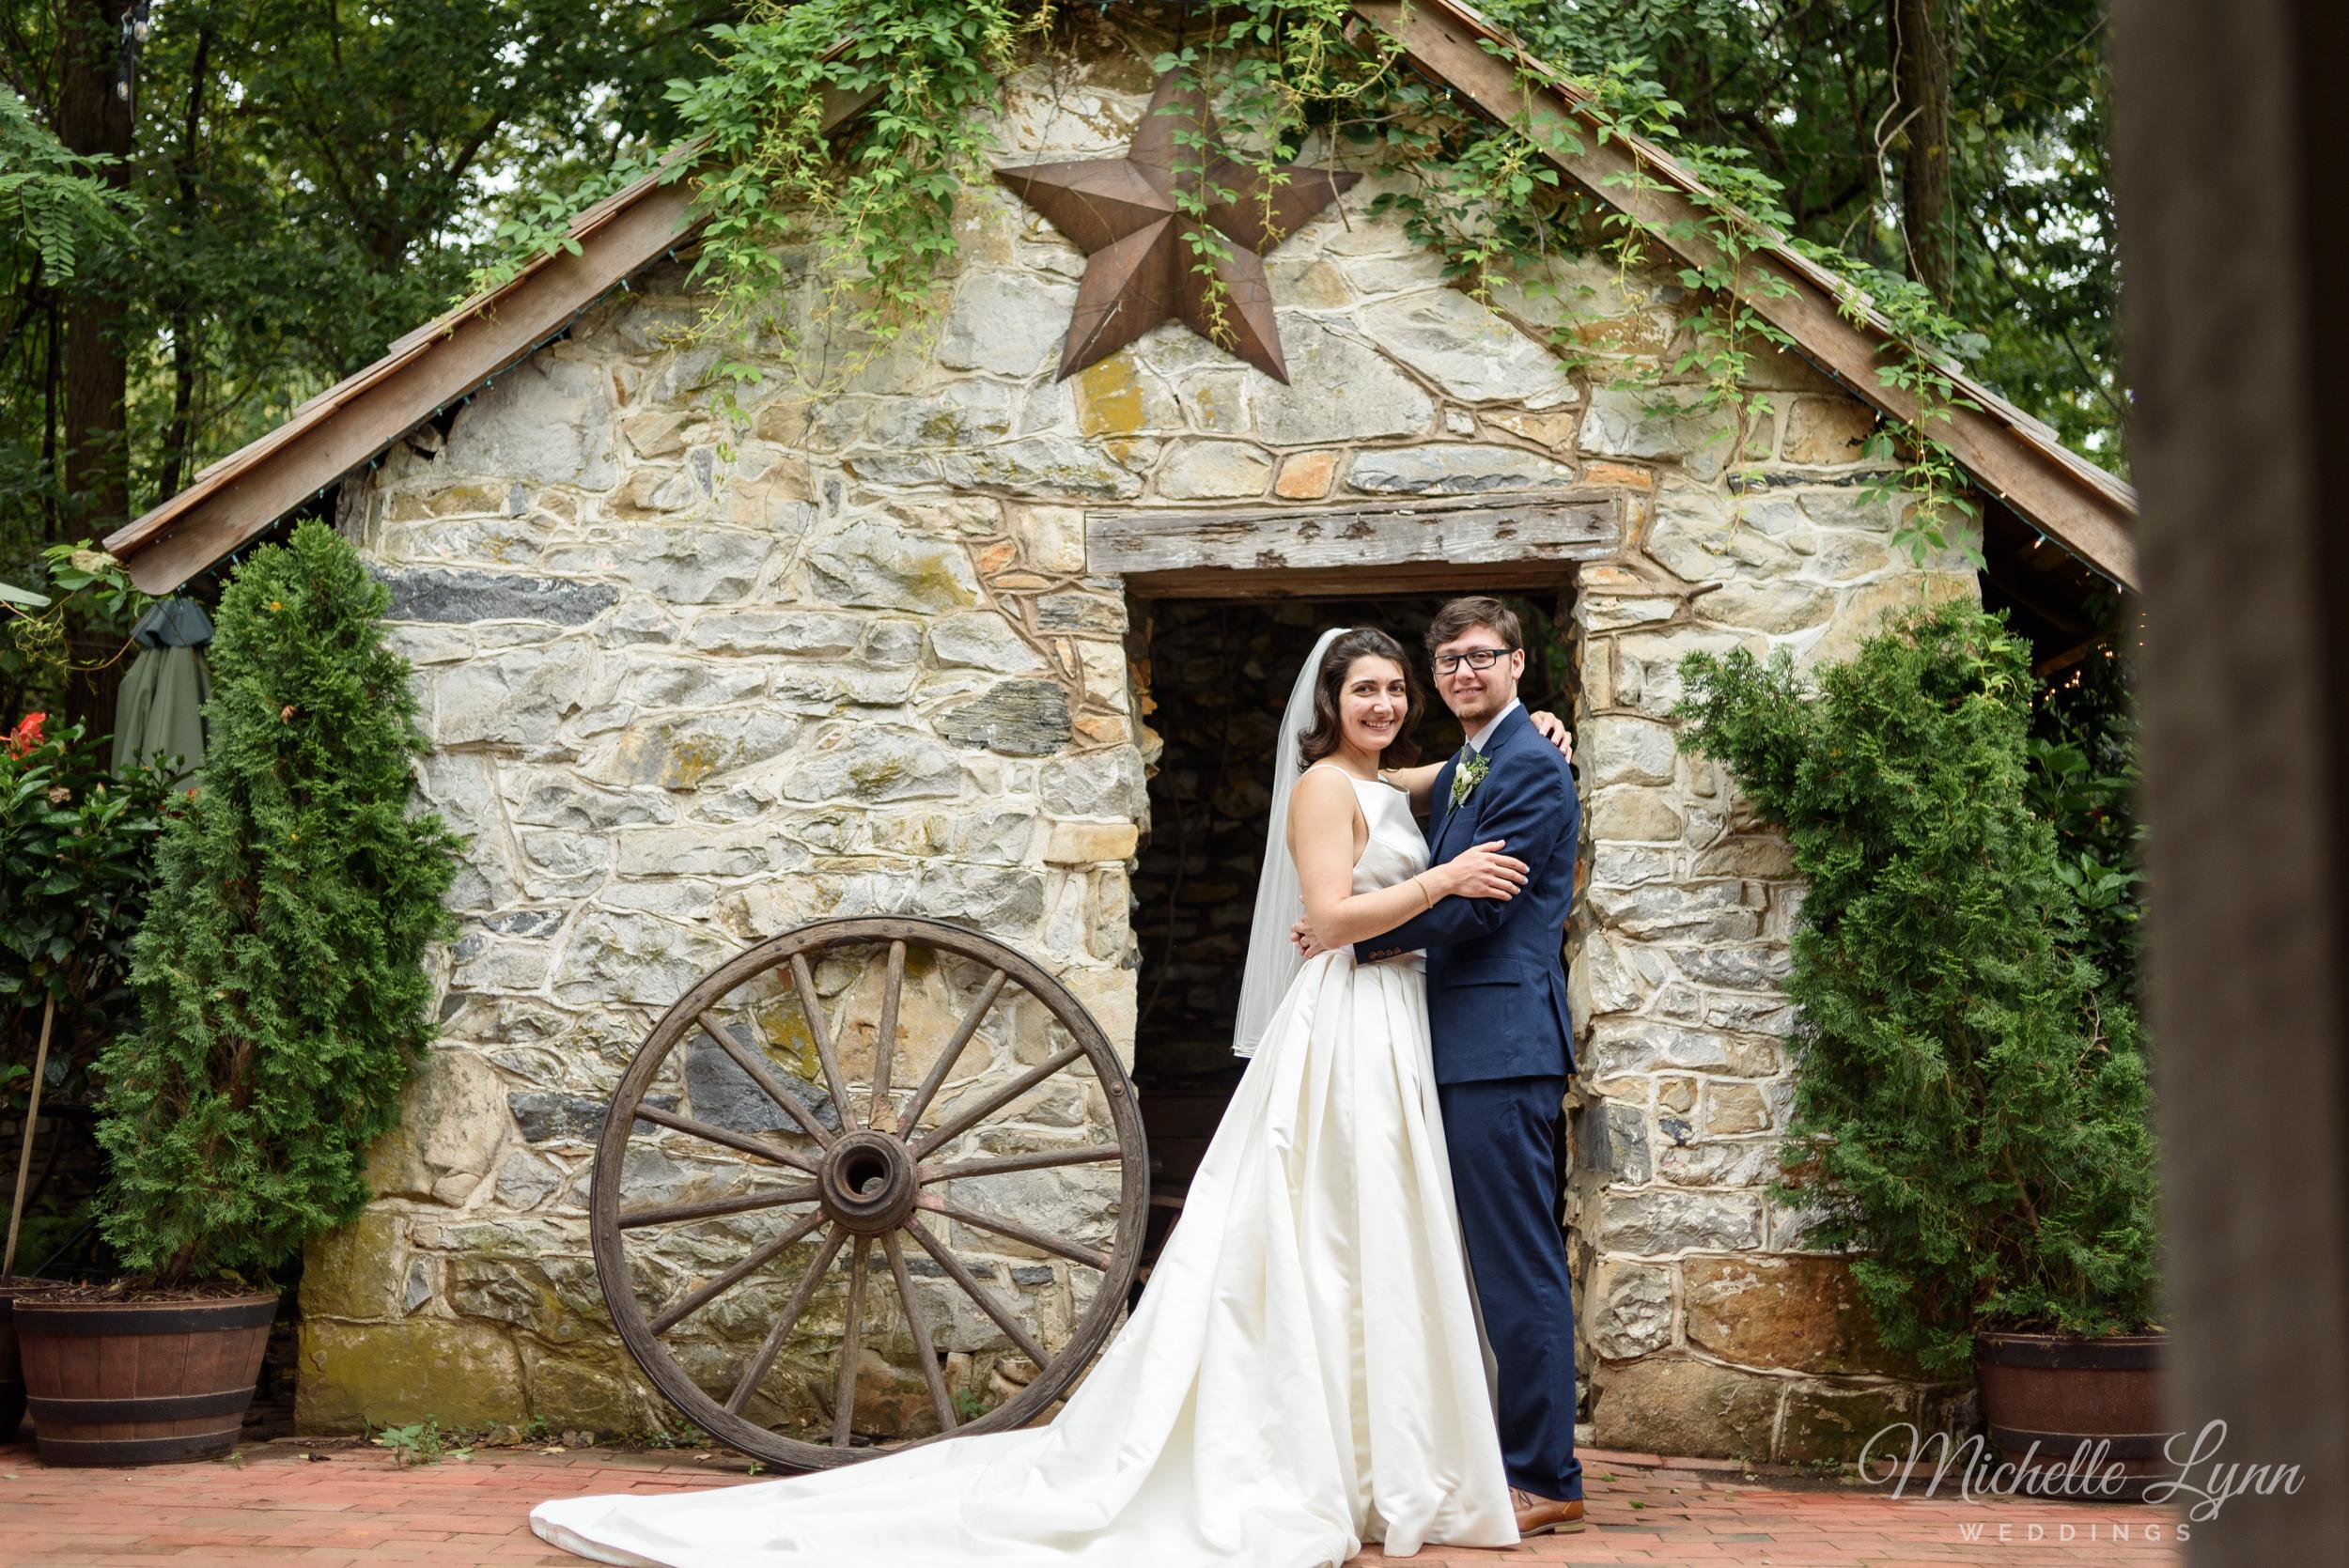 mlw-general-warren-malvern-wedding-photographer-51.jpg